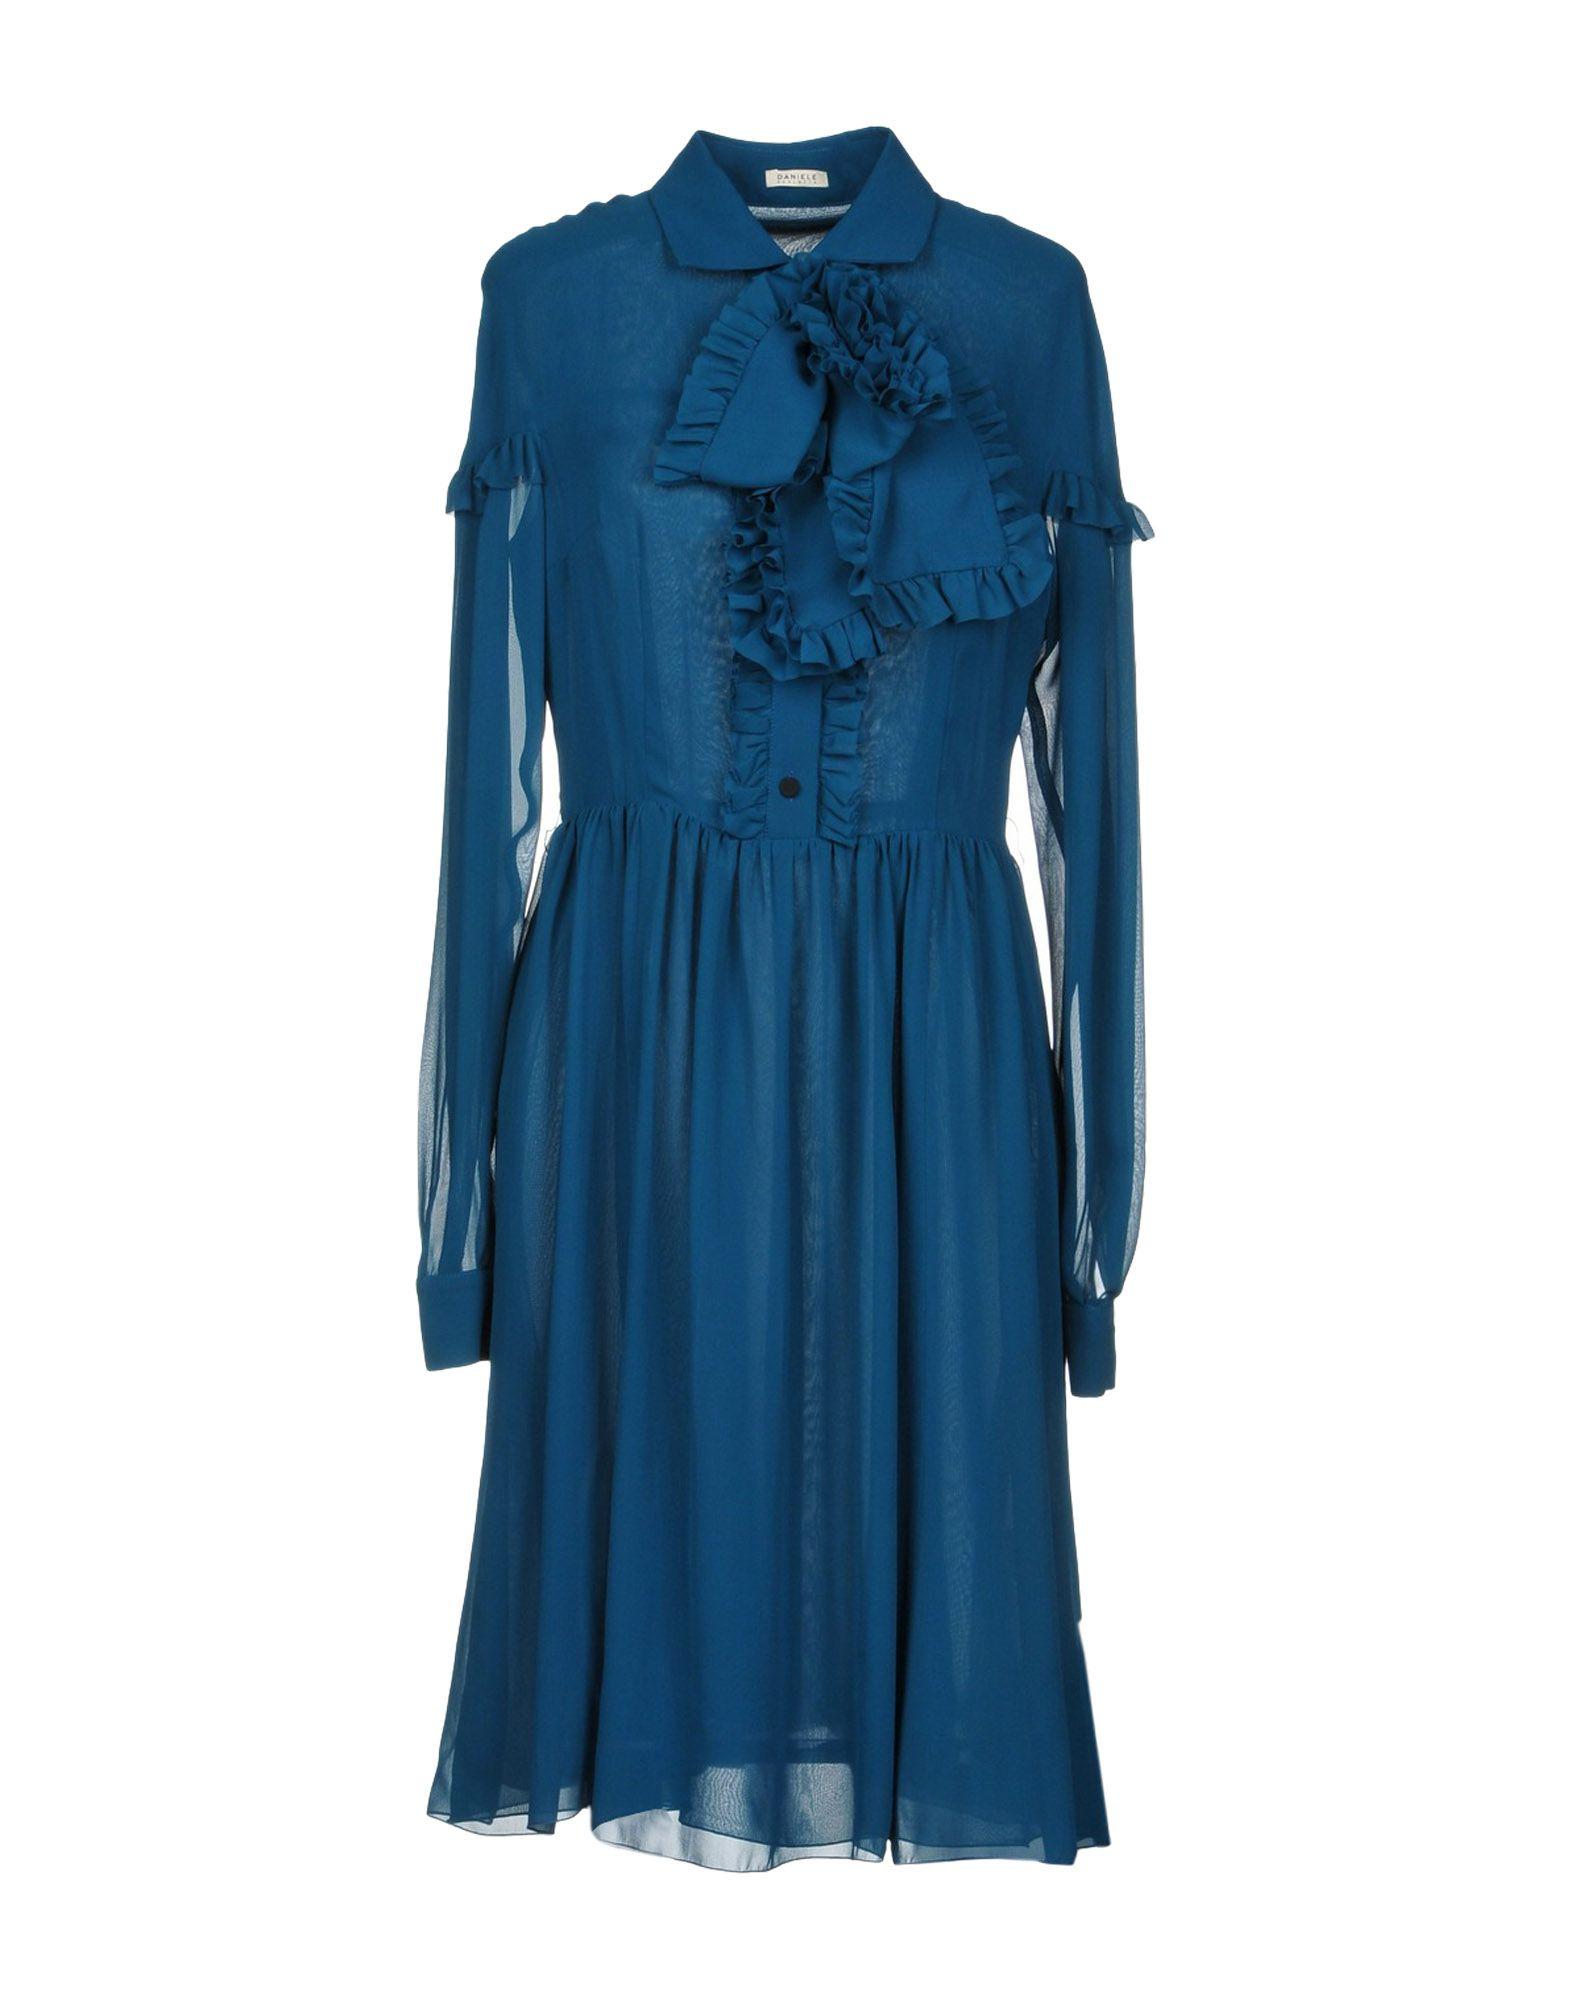 DANIELE CARLOTTA Knee-Length Dress in Deep Jade